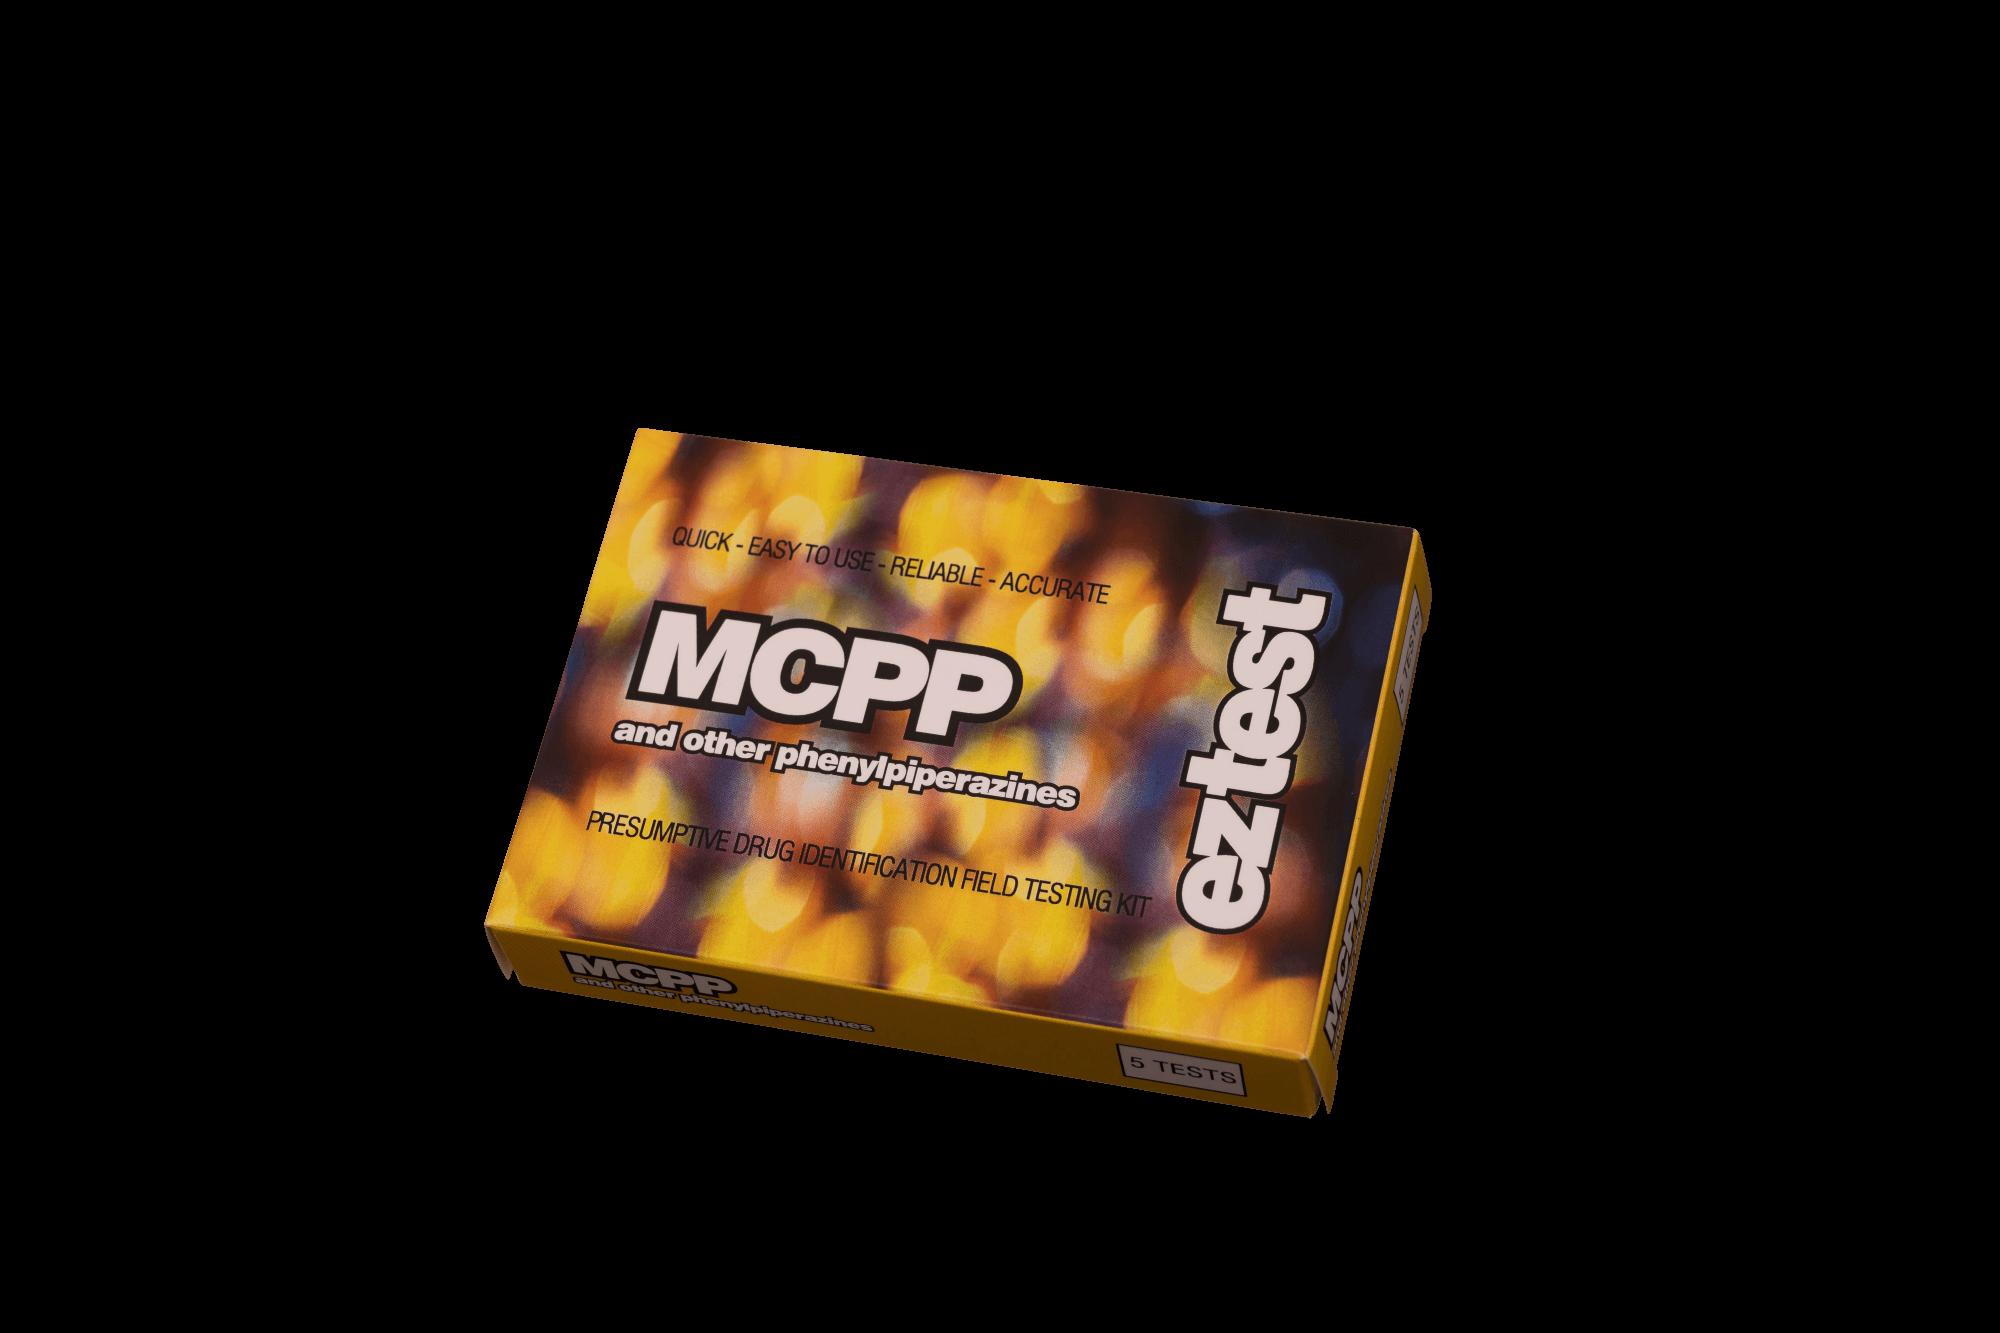 MCPP 5 Use Drug Testing Kit